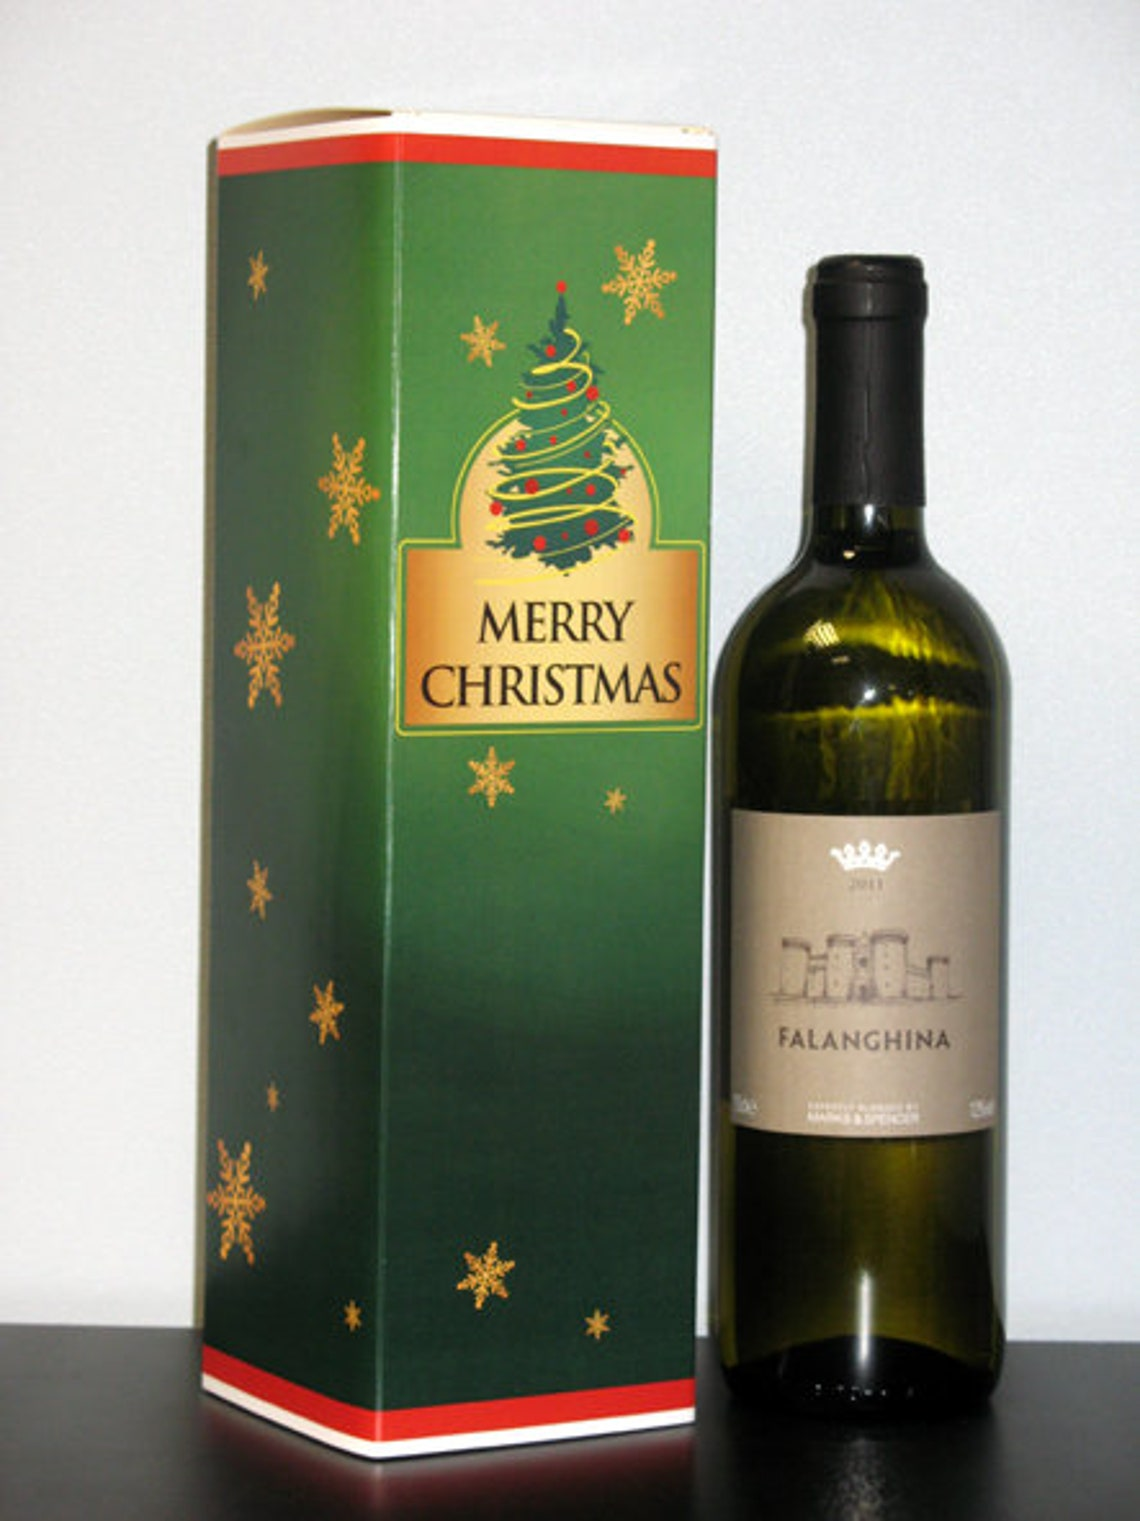 2x_Xmas Gift Bottle Boxes  Festive Christmas Designs image 0